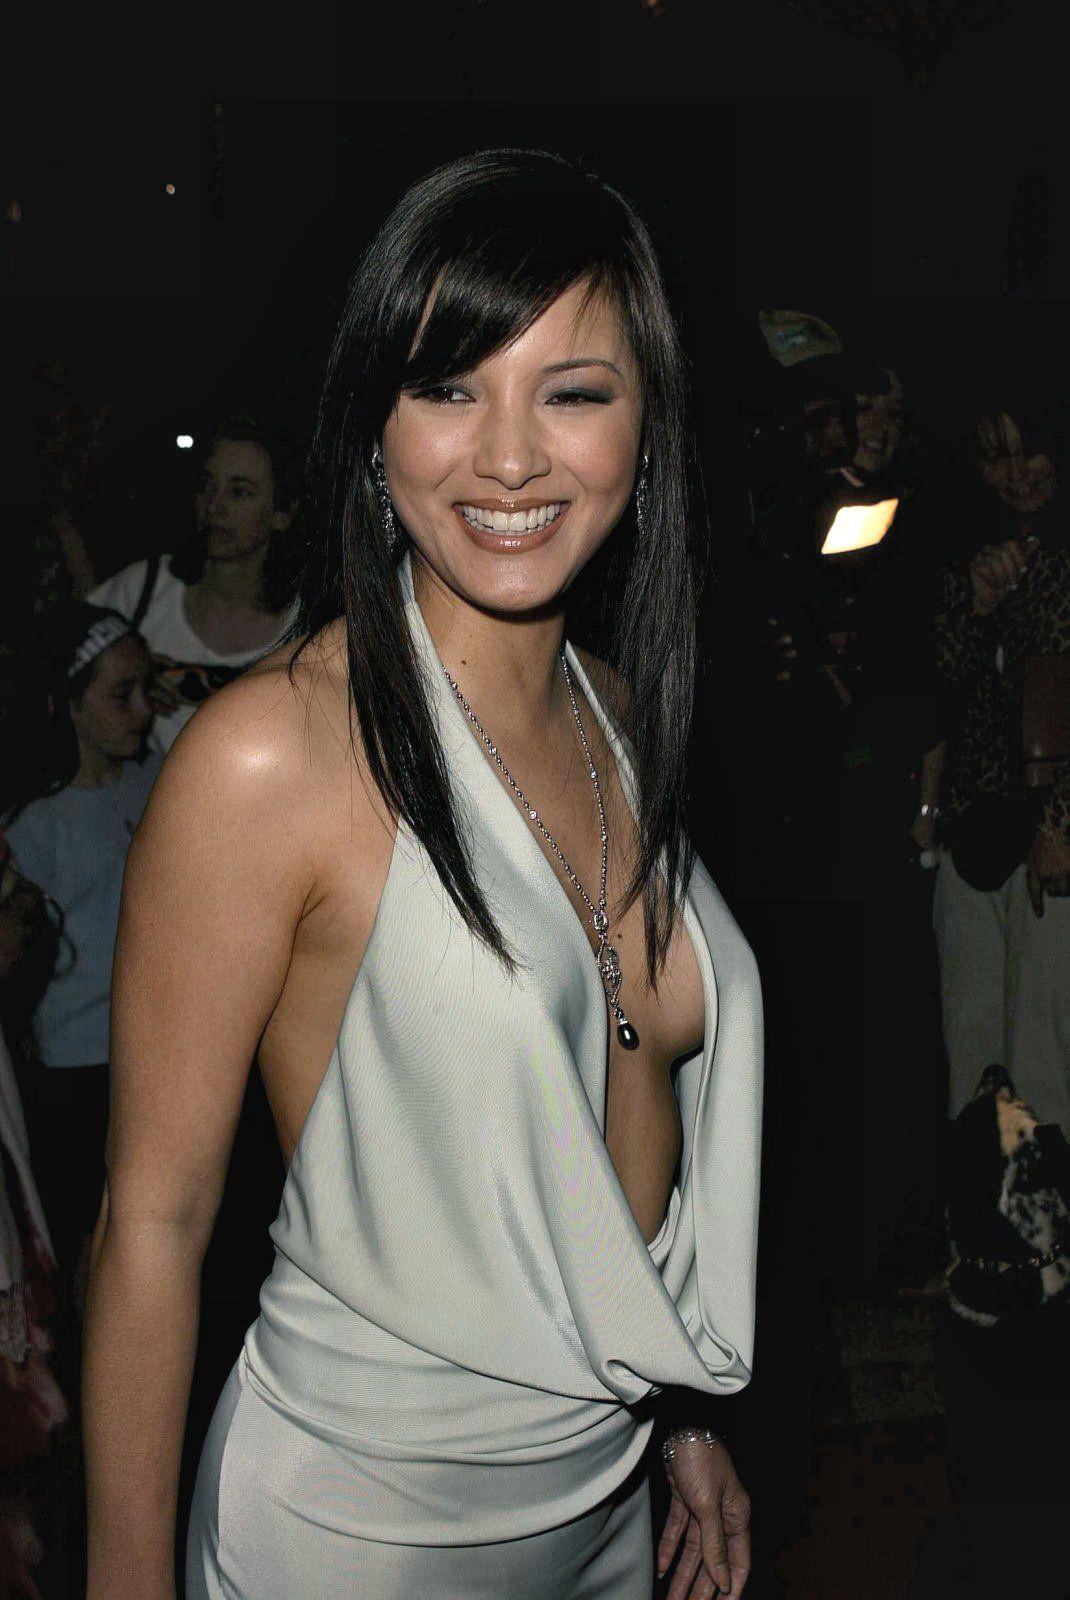 Pics Kelly Hu naked (69 foto and video), Tits, Paparazzi, Feet, in bikini 2019